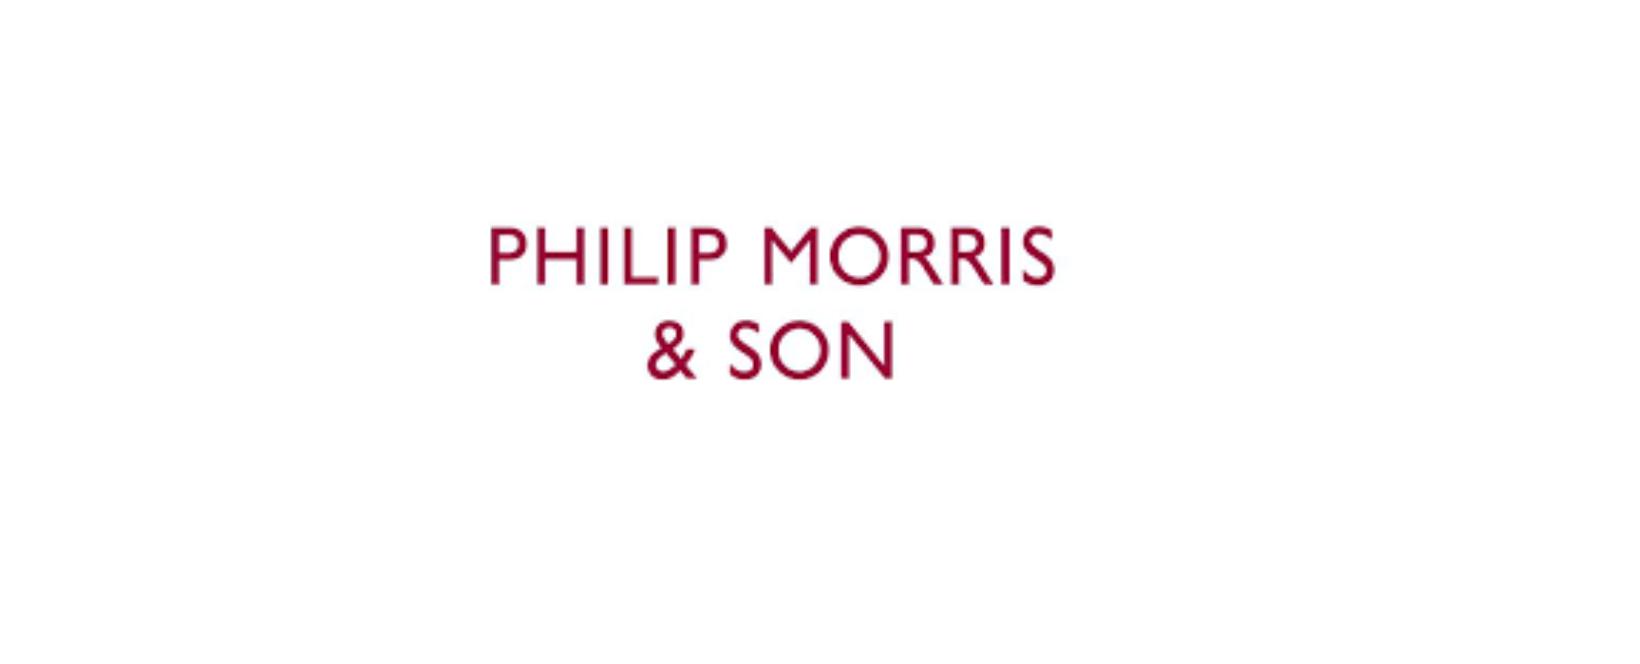 Philip Morris & Son UK Discount Code 2021